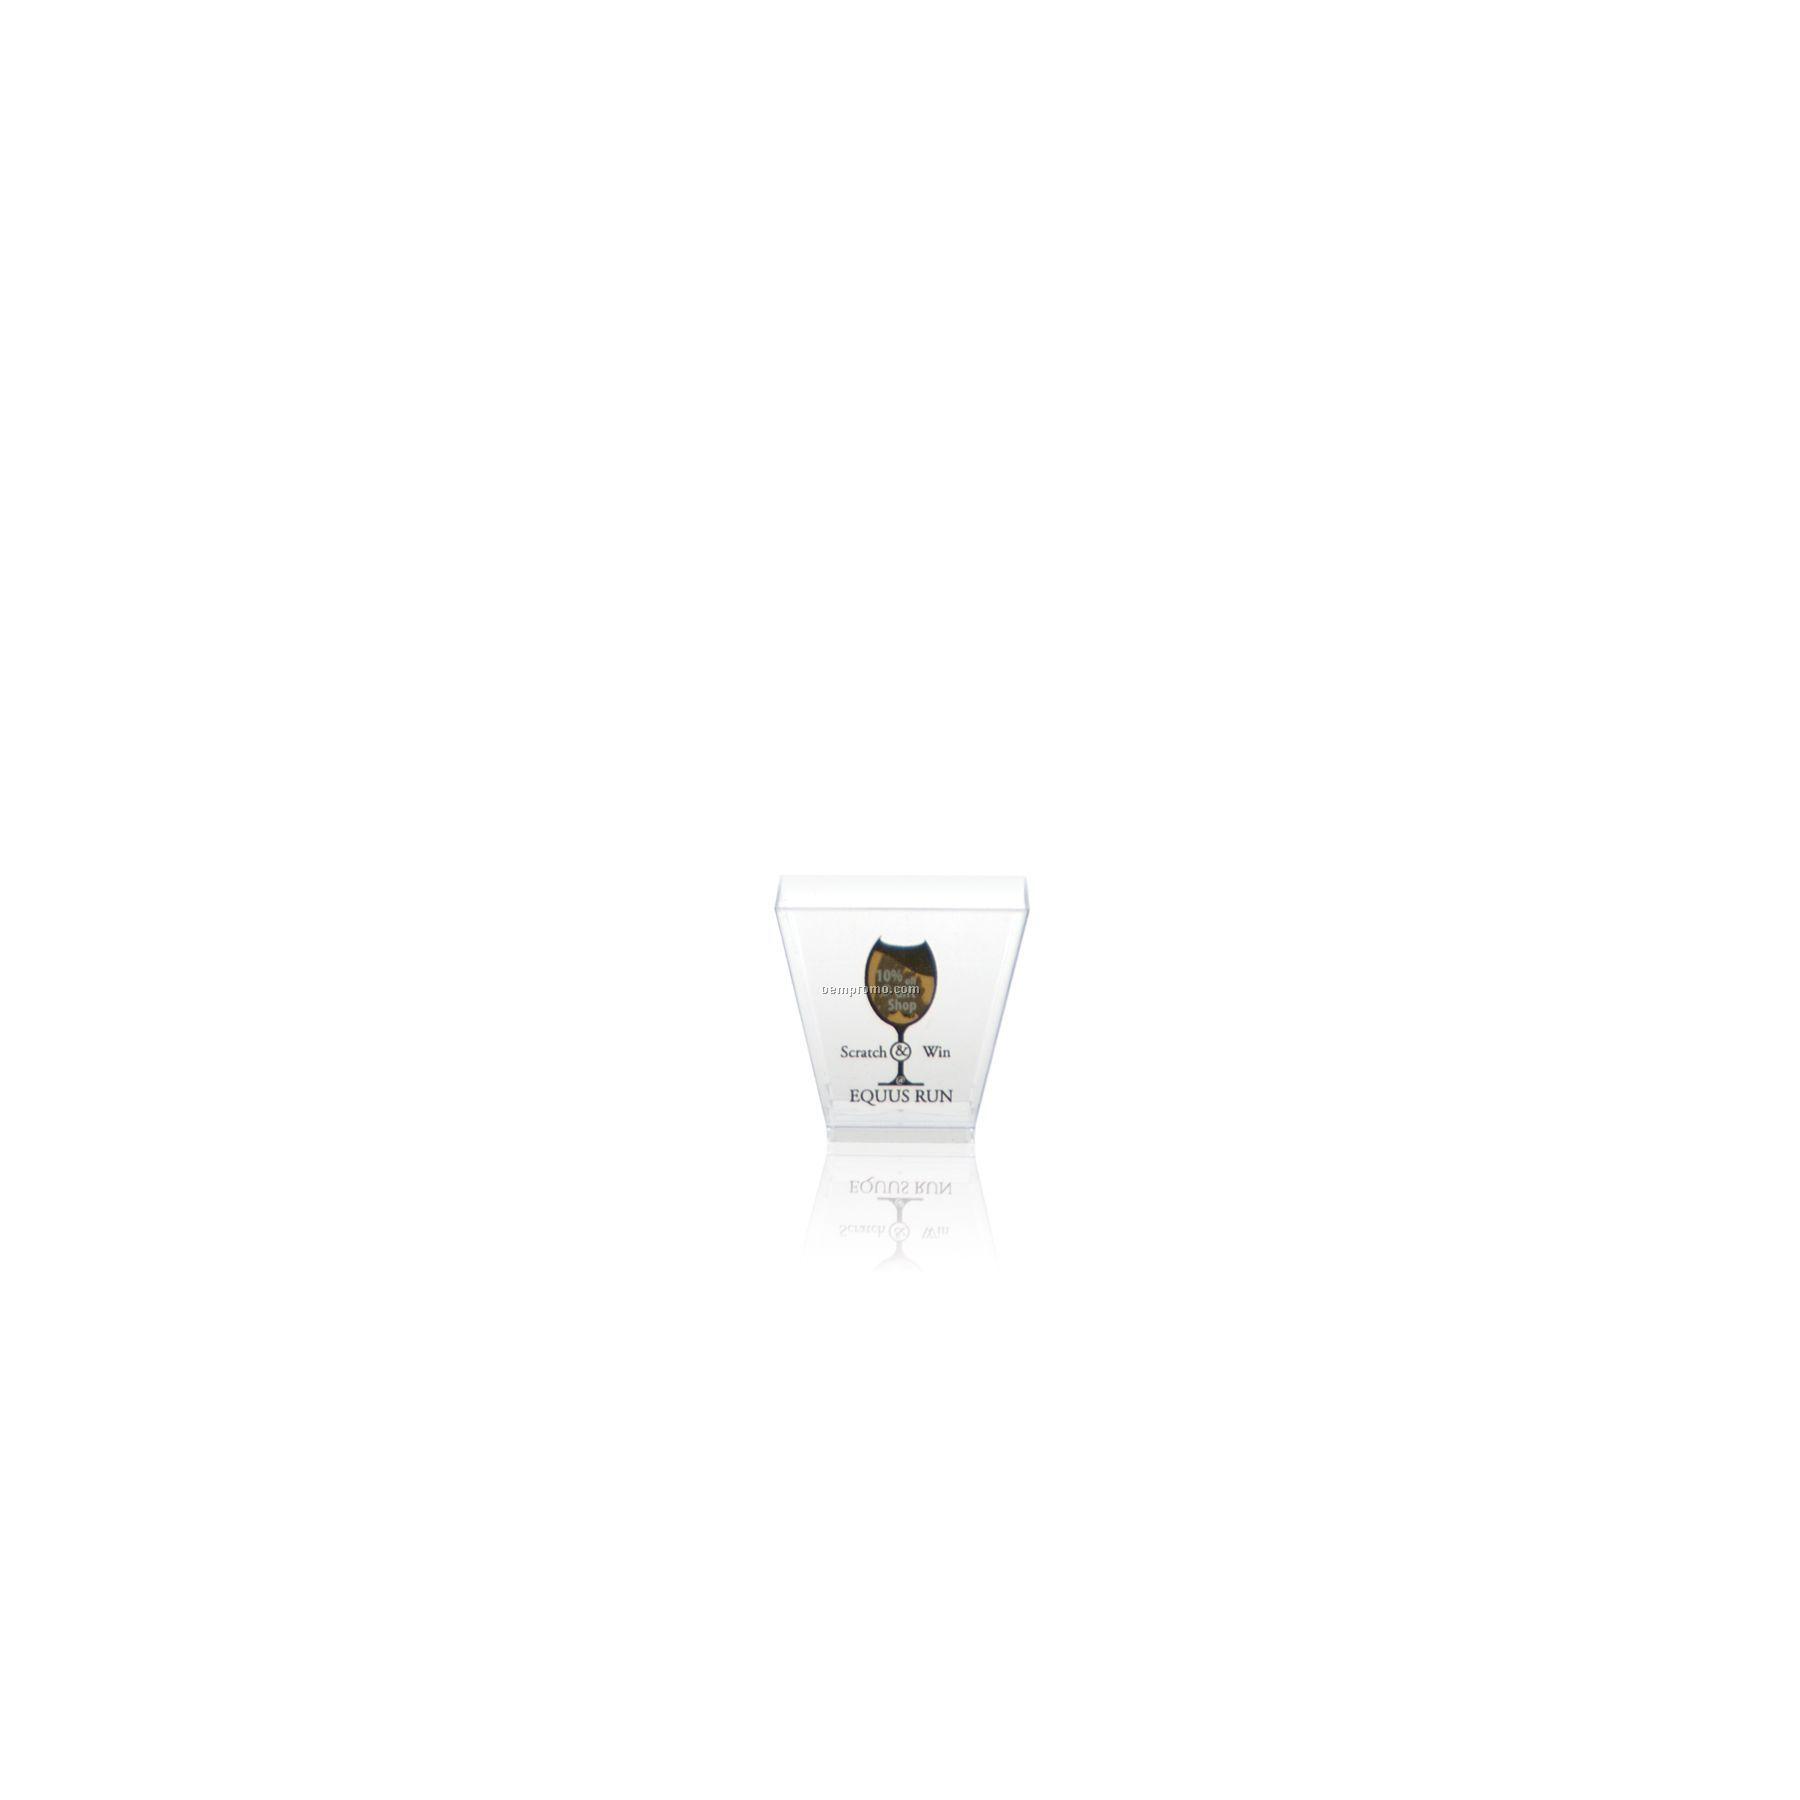 1.75 Oz. Square Clear Plastic Shot Glass